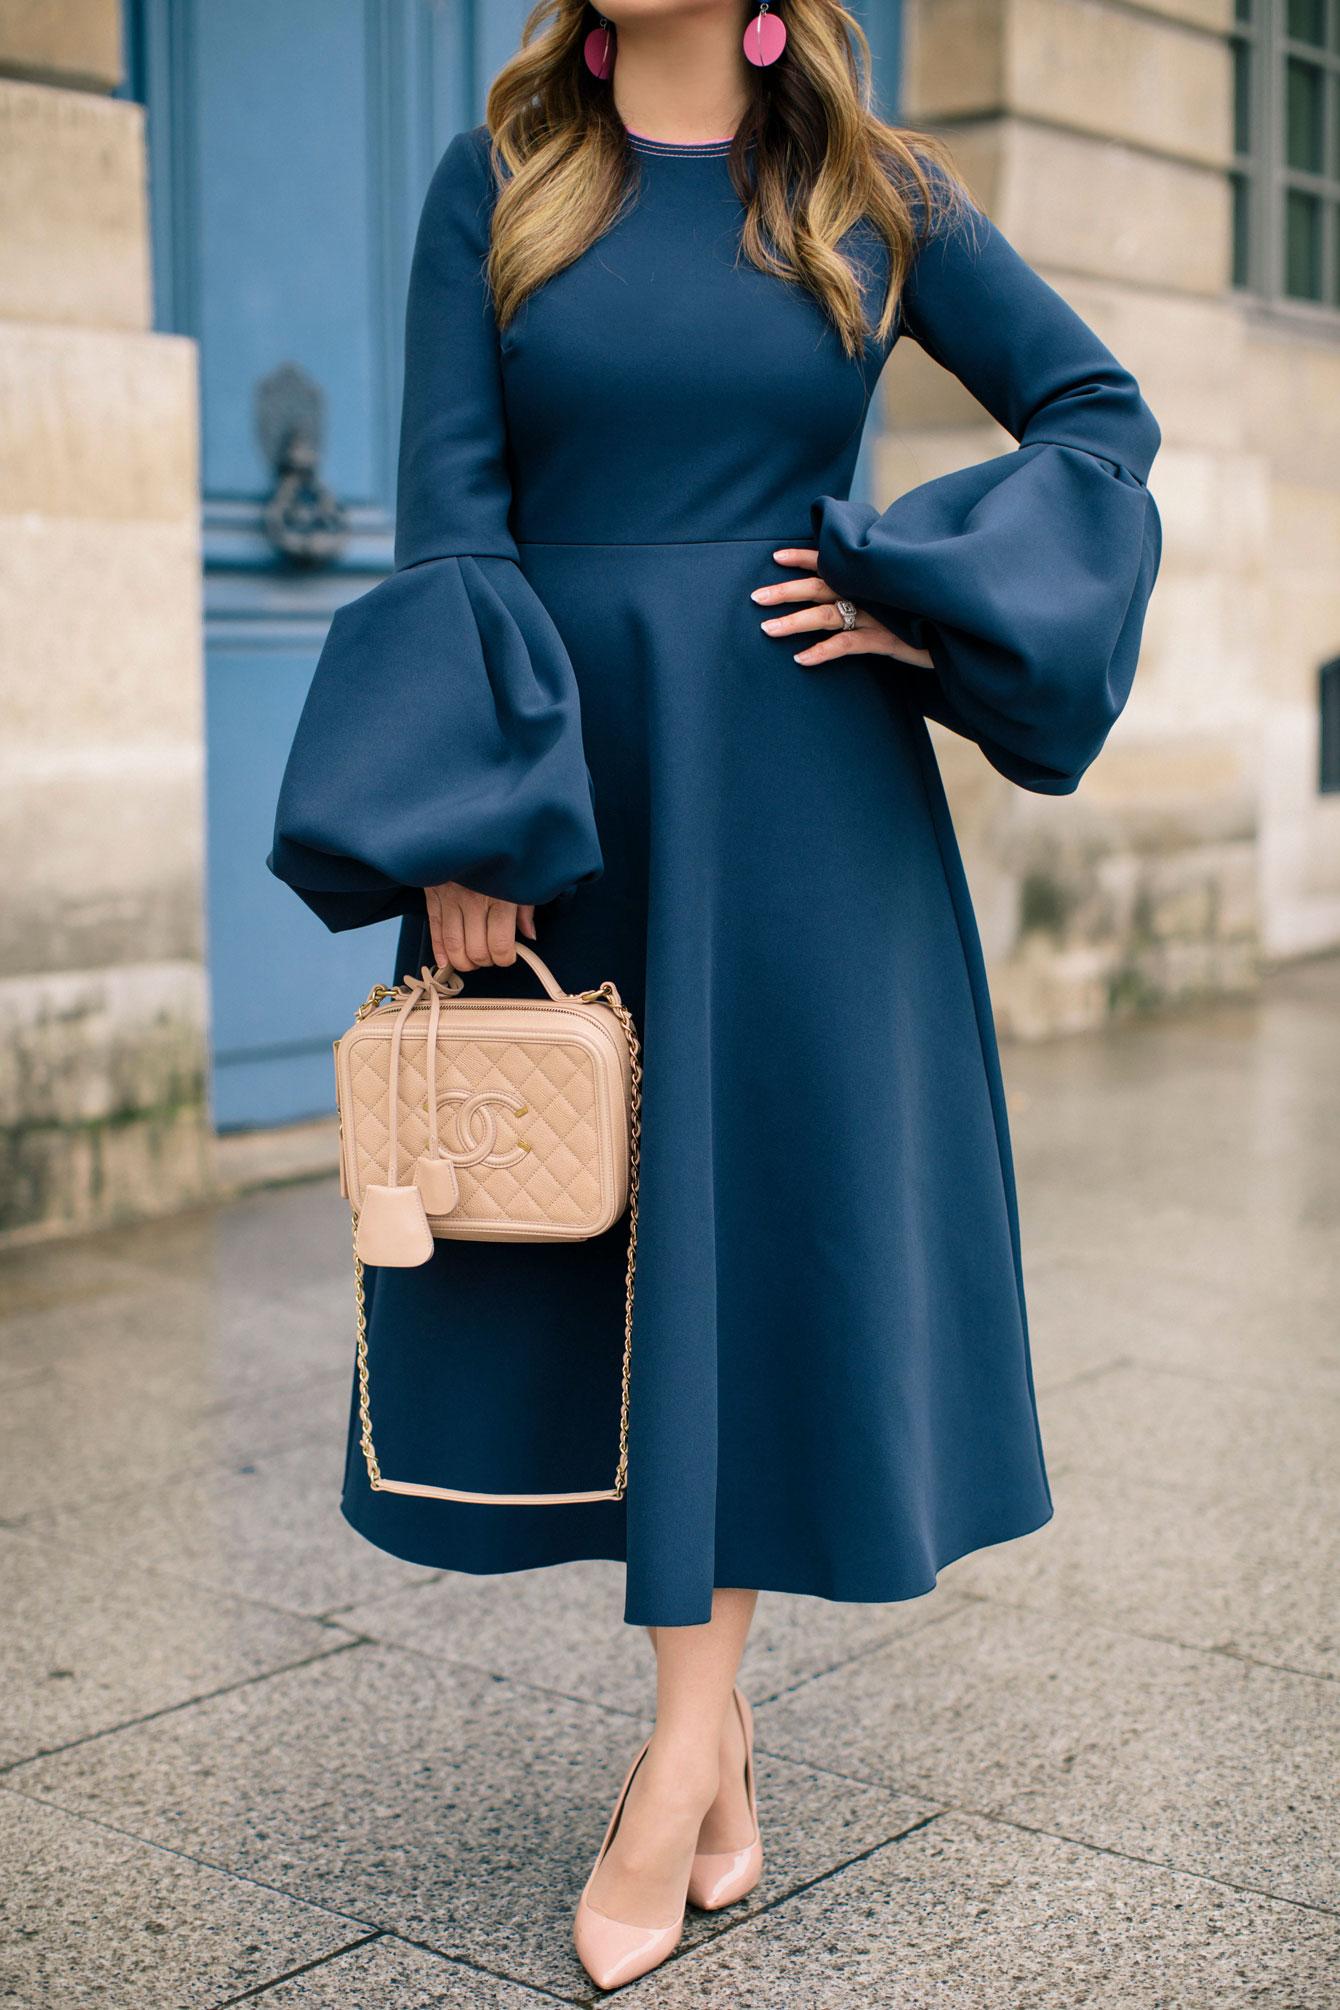 Chanel Filigree Vanity Case Bag